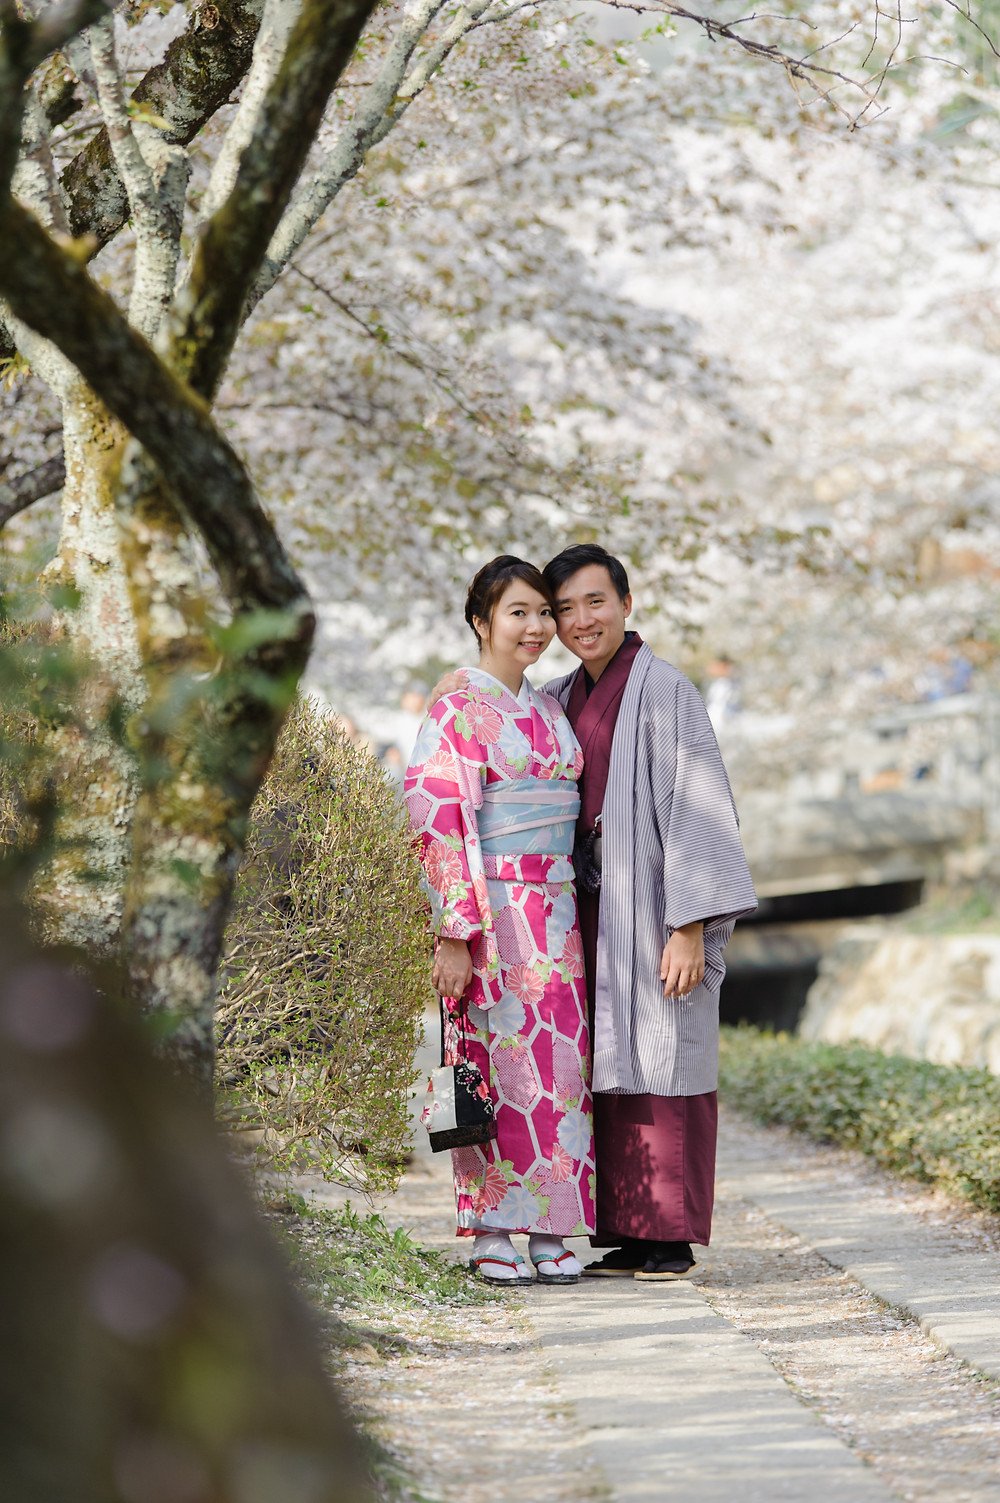 Posing under the Sakura in Kimono